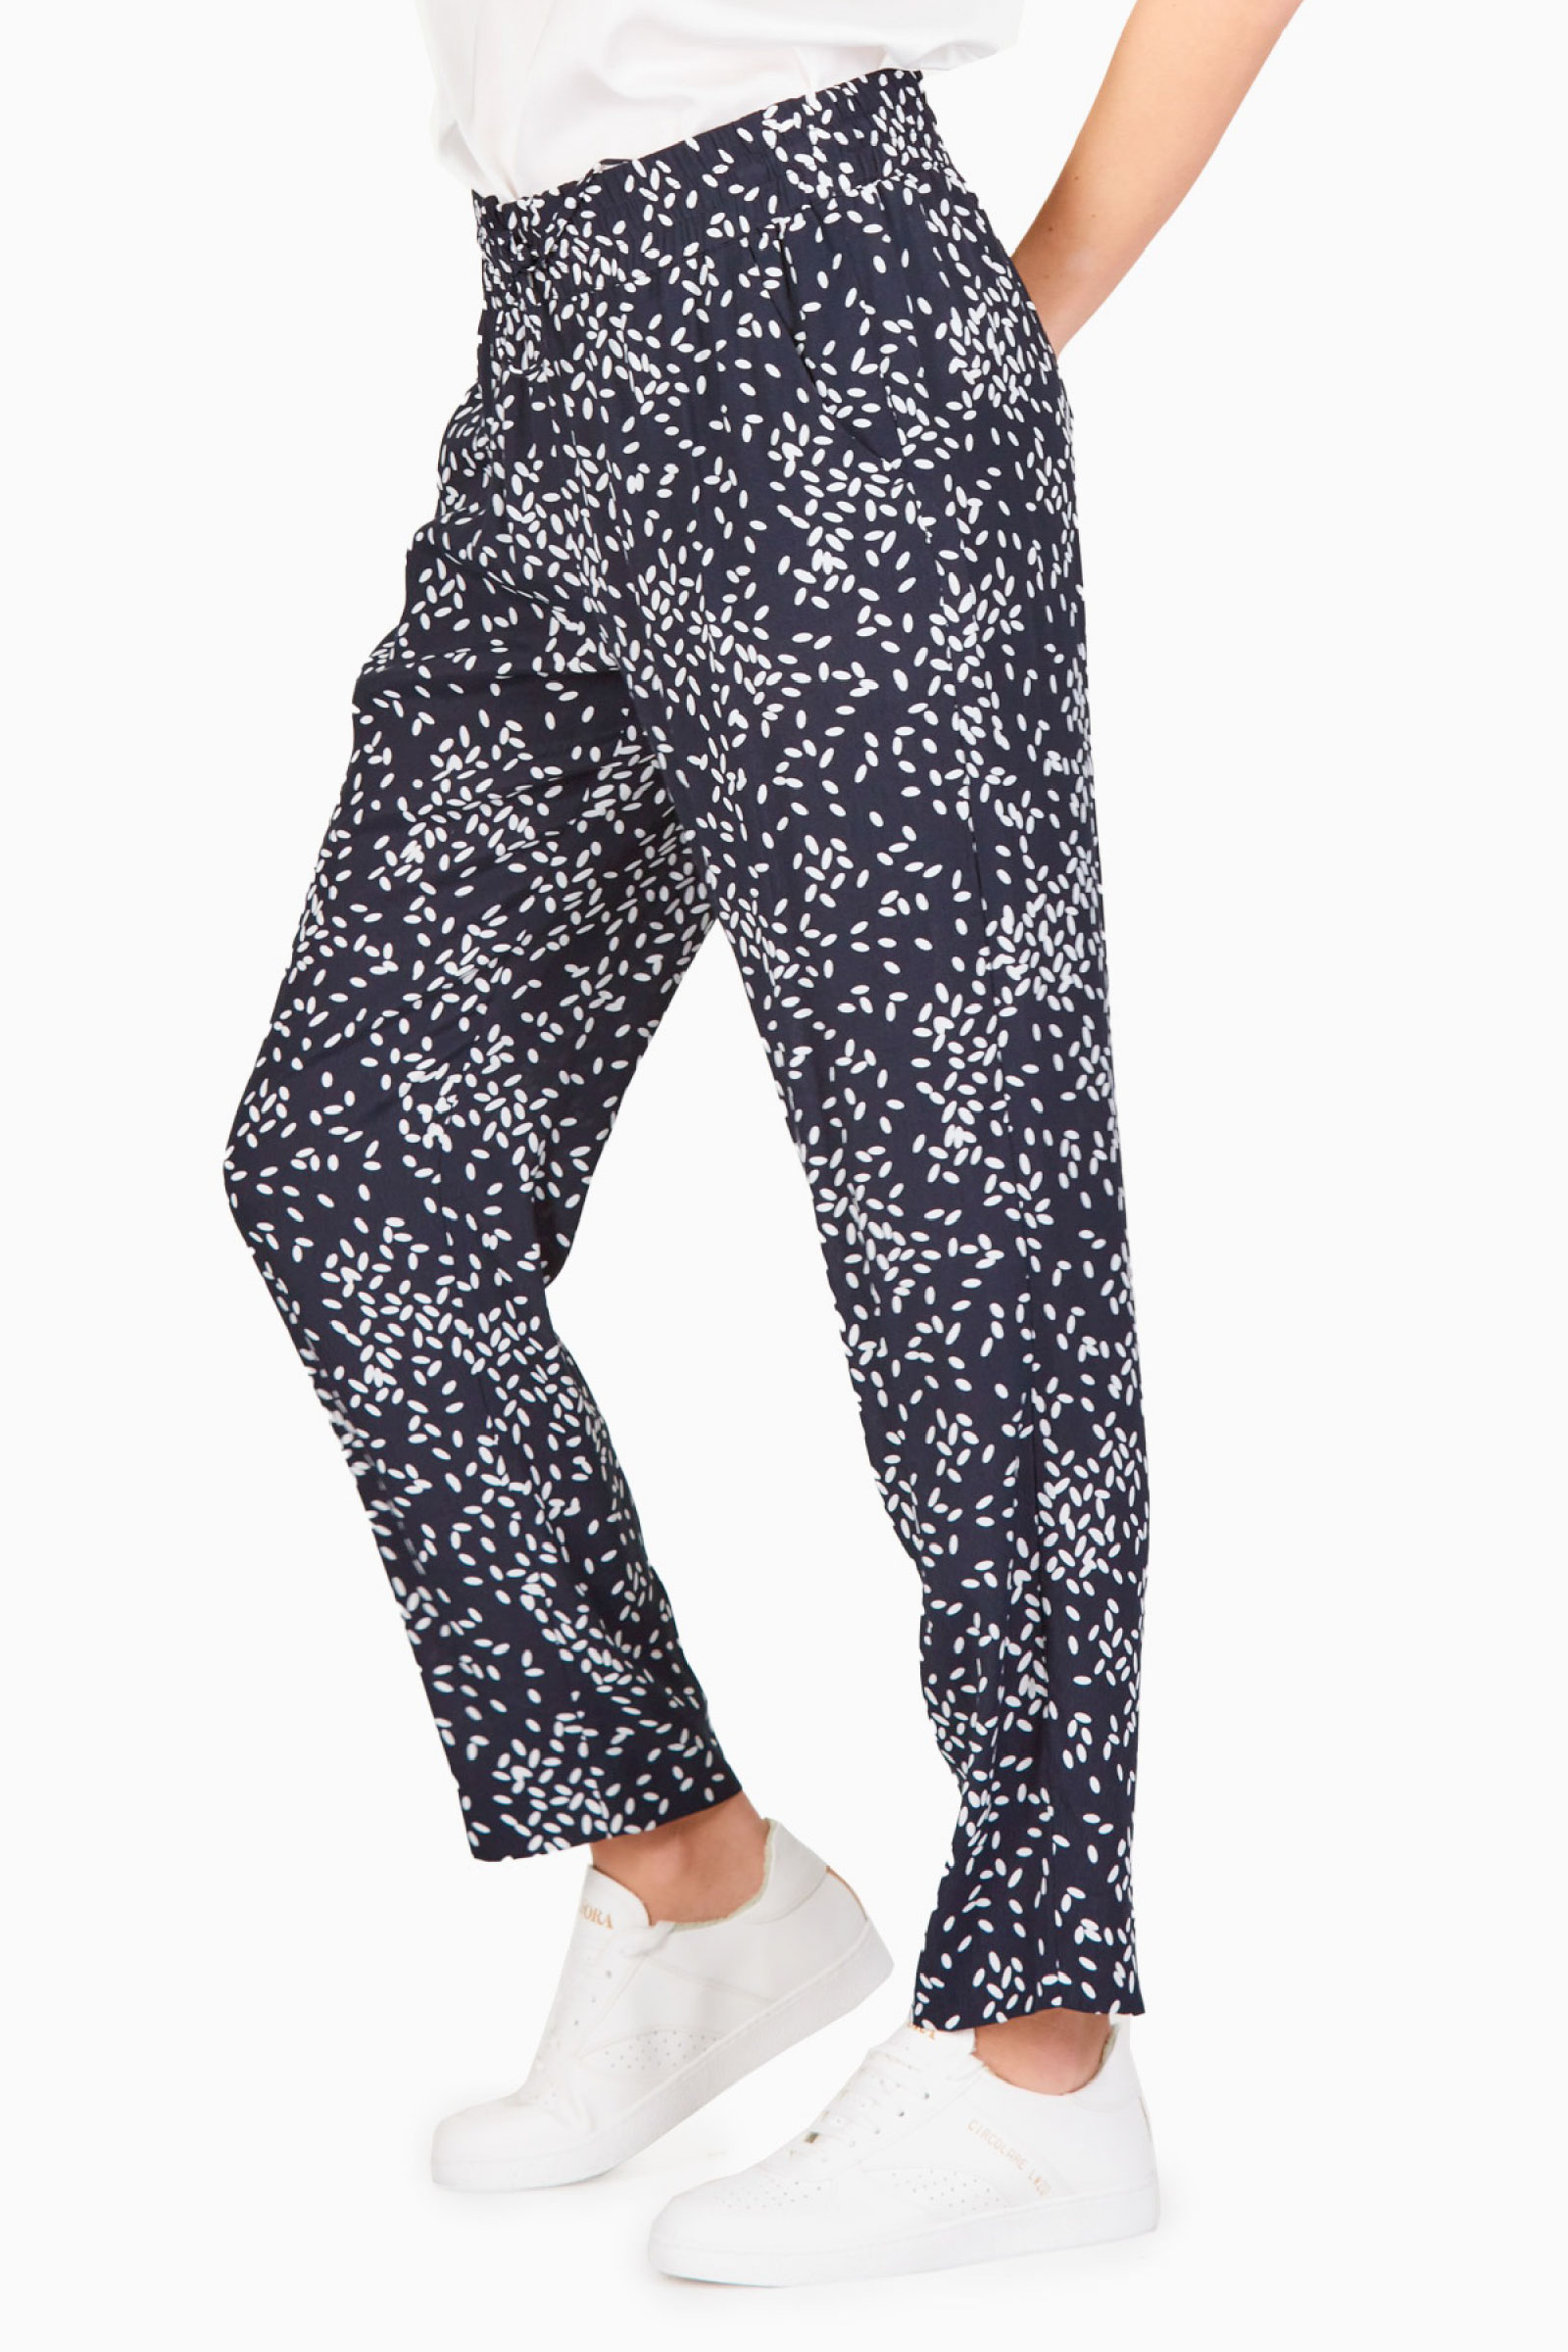 EMME MARELLA Pantalone Modello AVION EMME MARELLA | Pantalone | 51311615000004